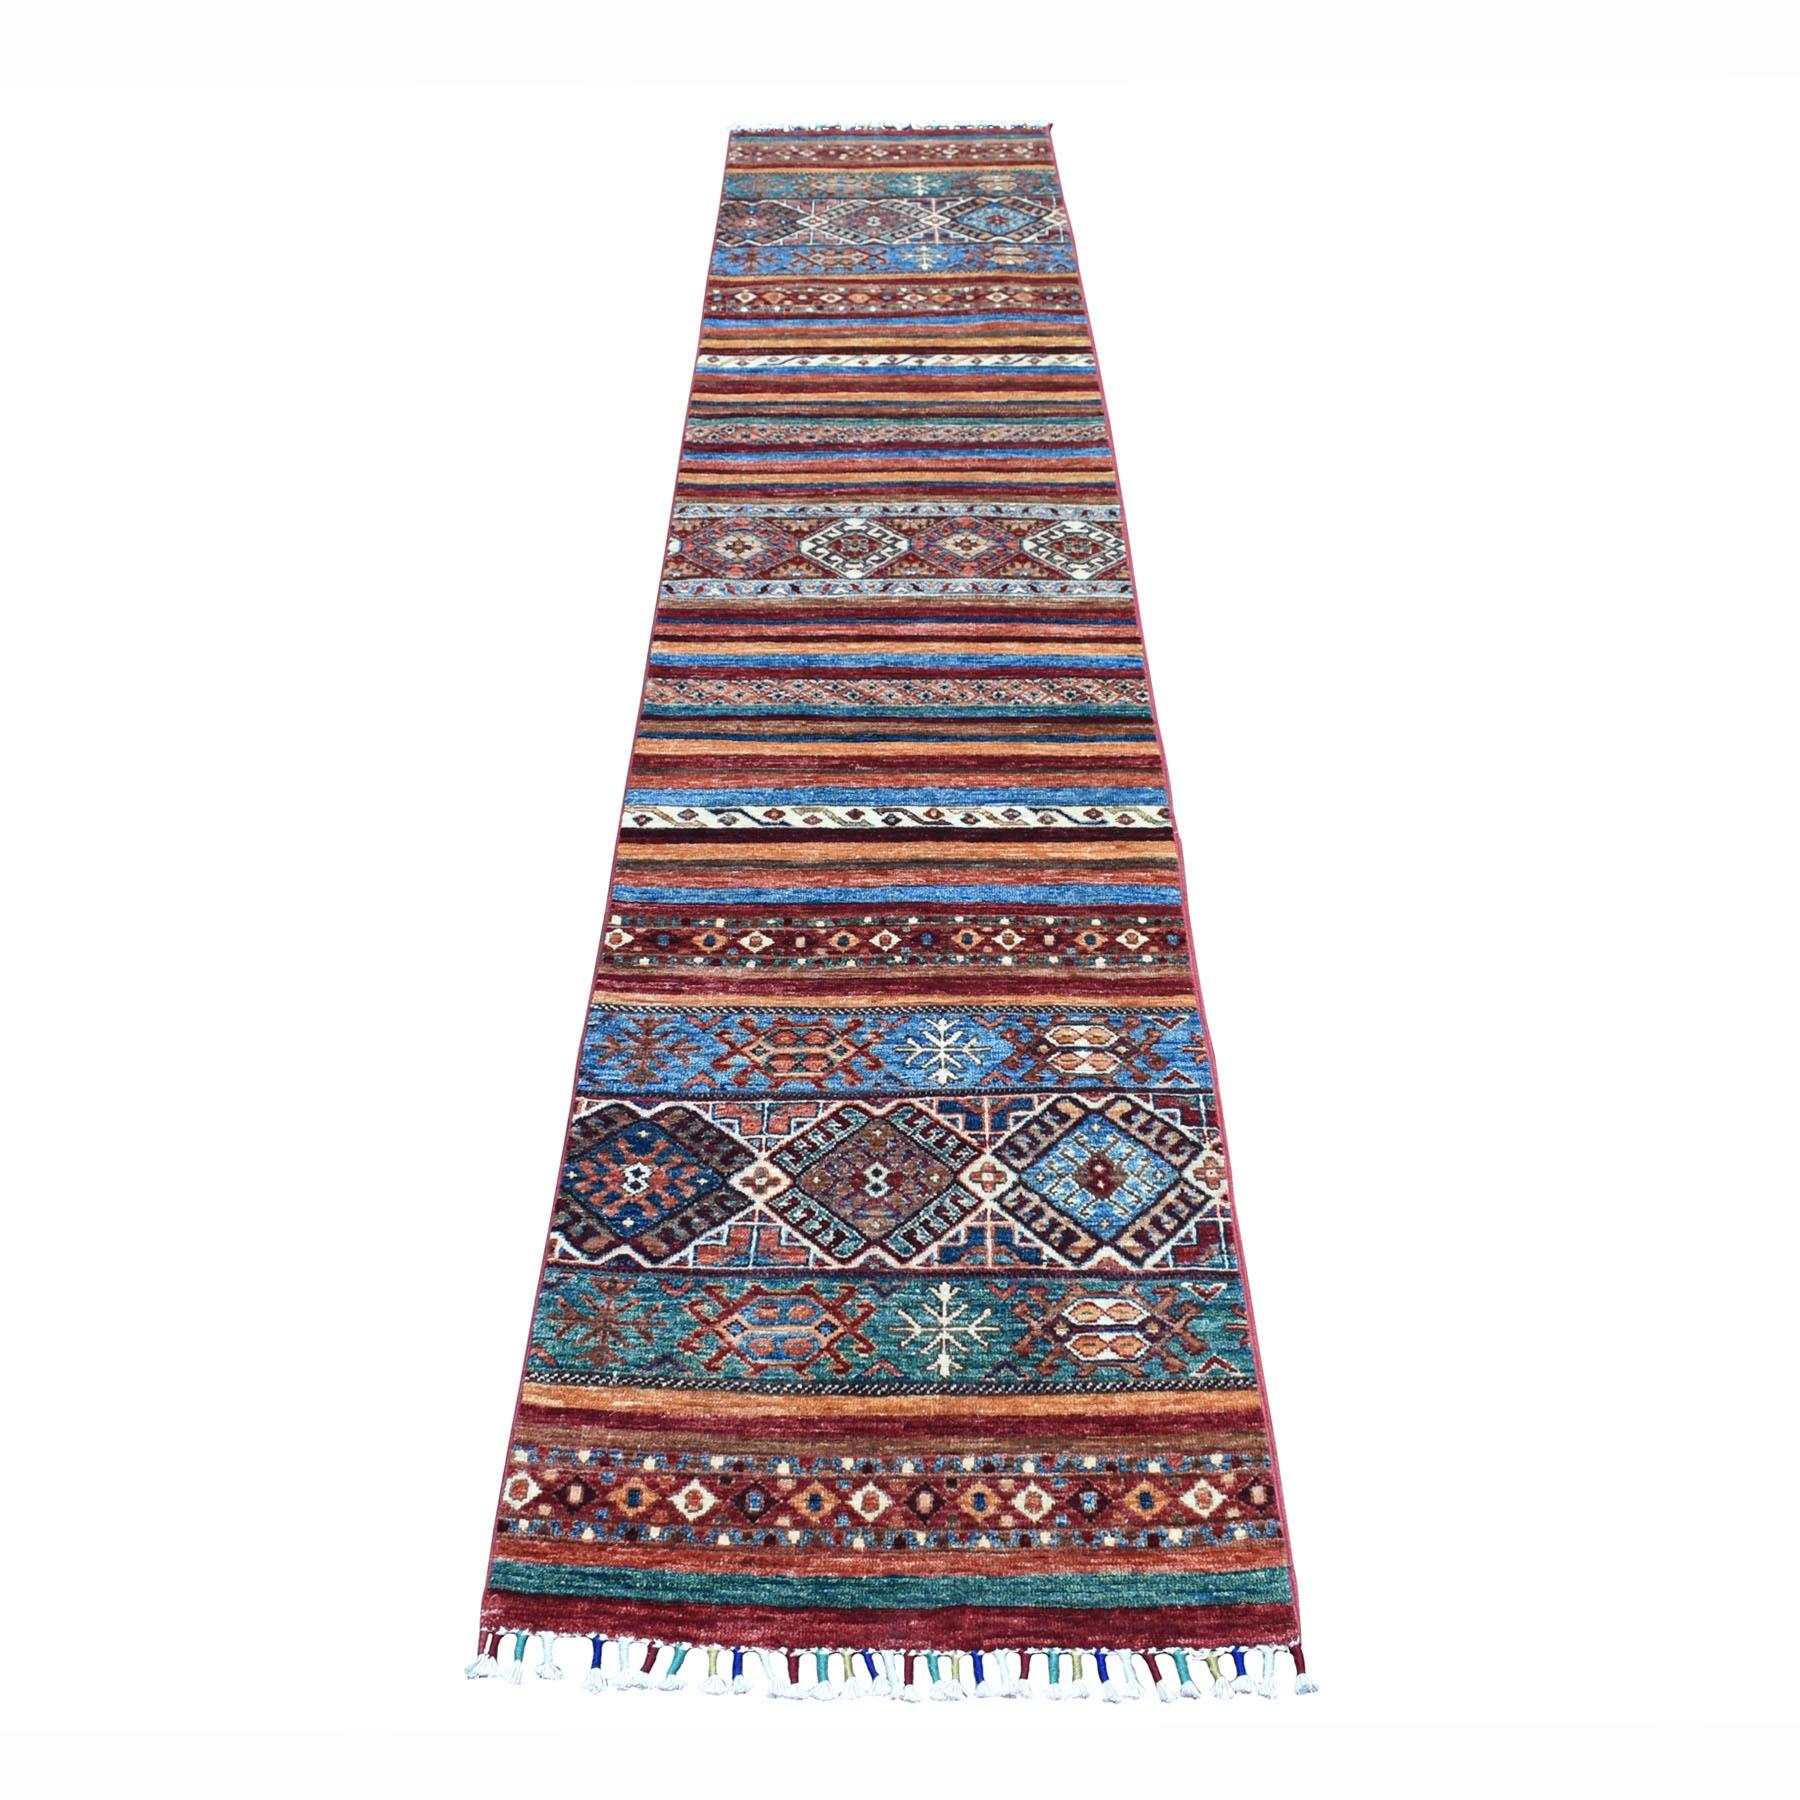 "2'X10'2"" Khorjin Design Runner Red Super Kazak Geometric Hand Knotted 100% Wool Oriental Rug moaeb80c"